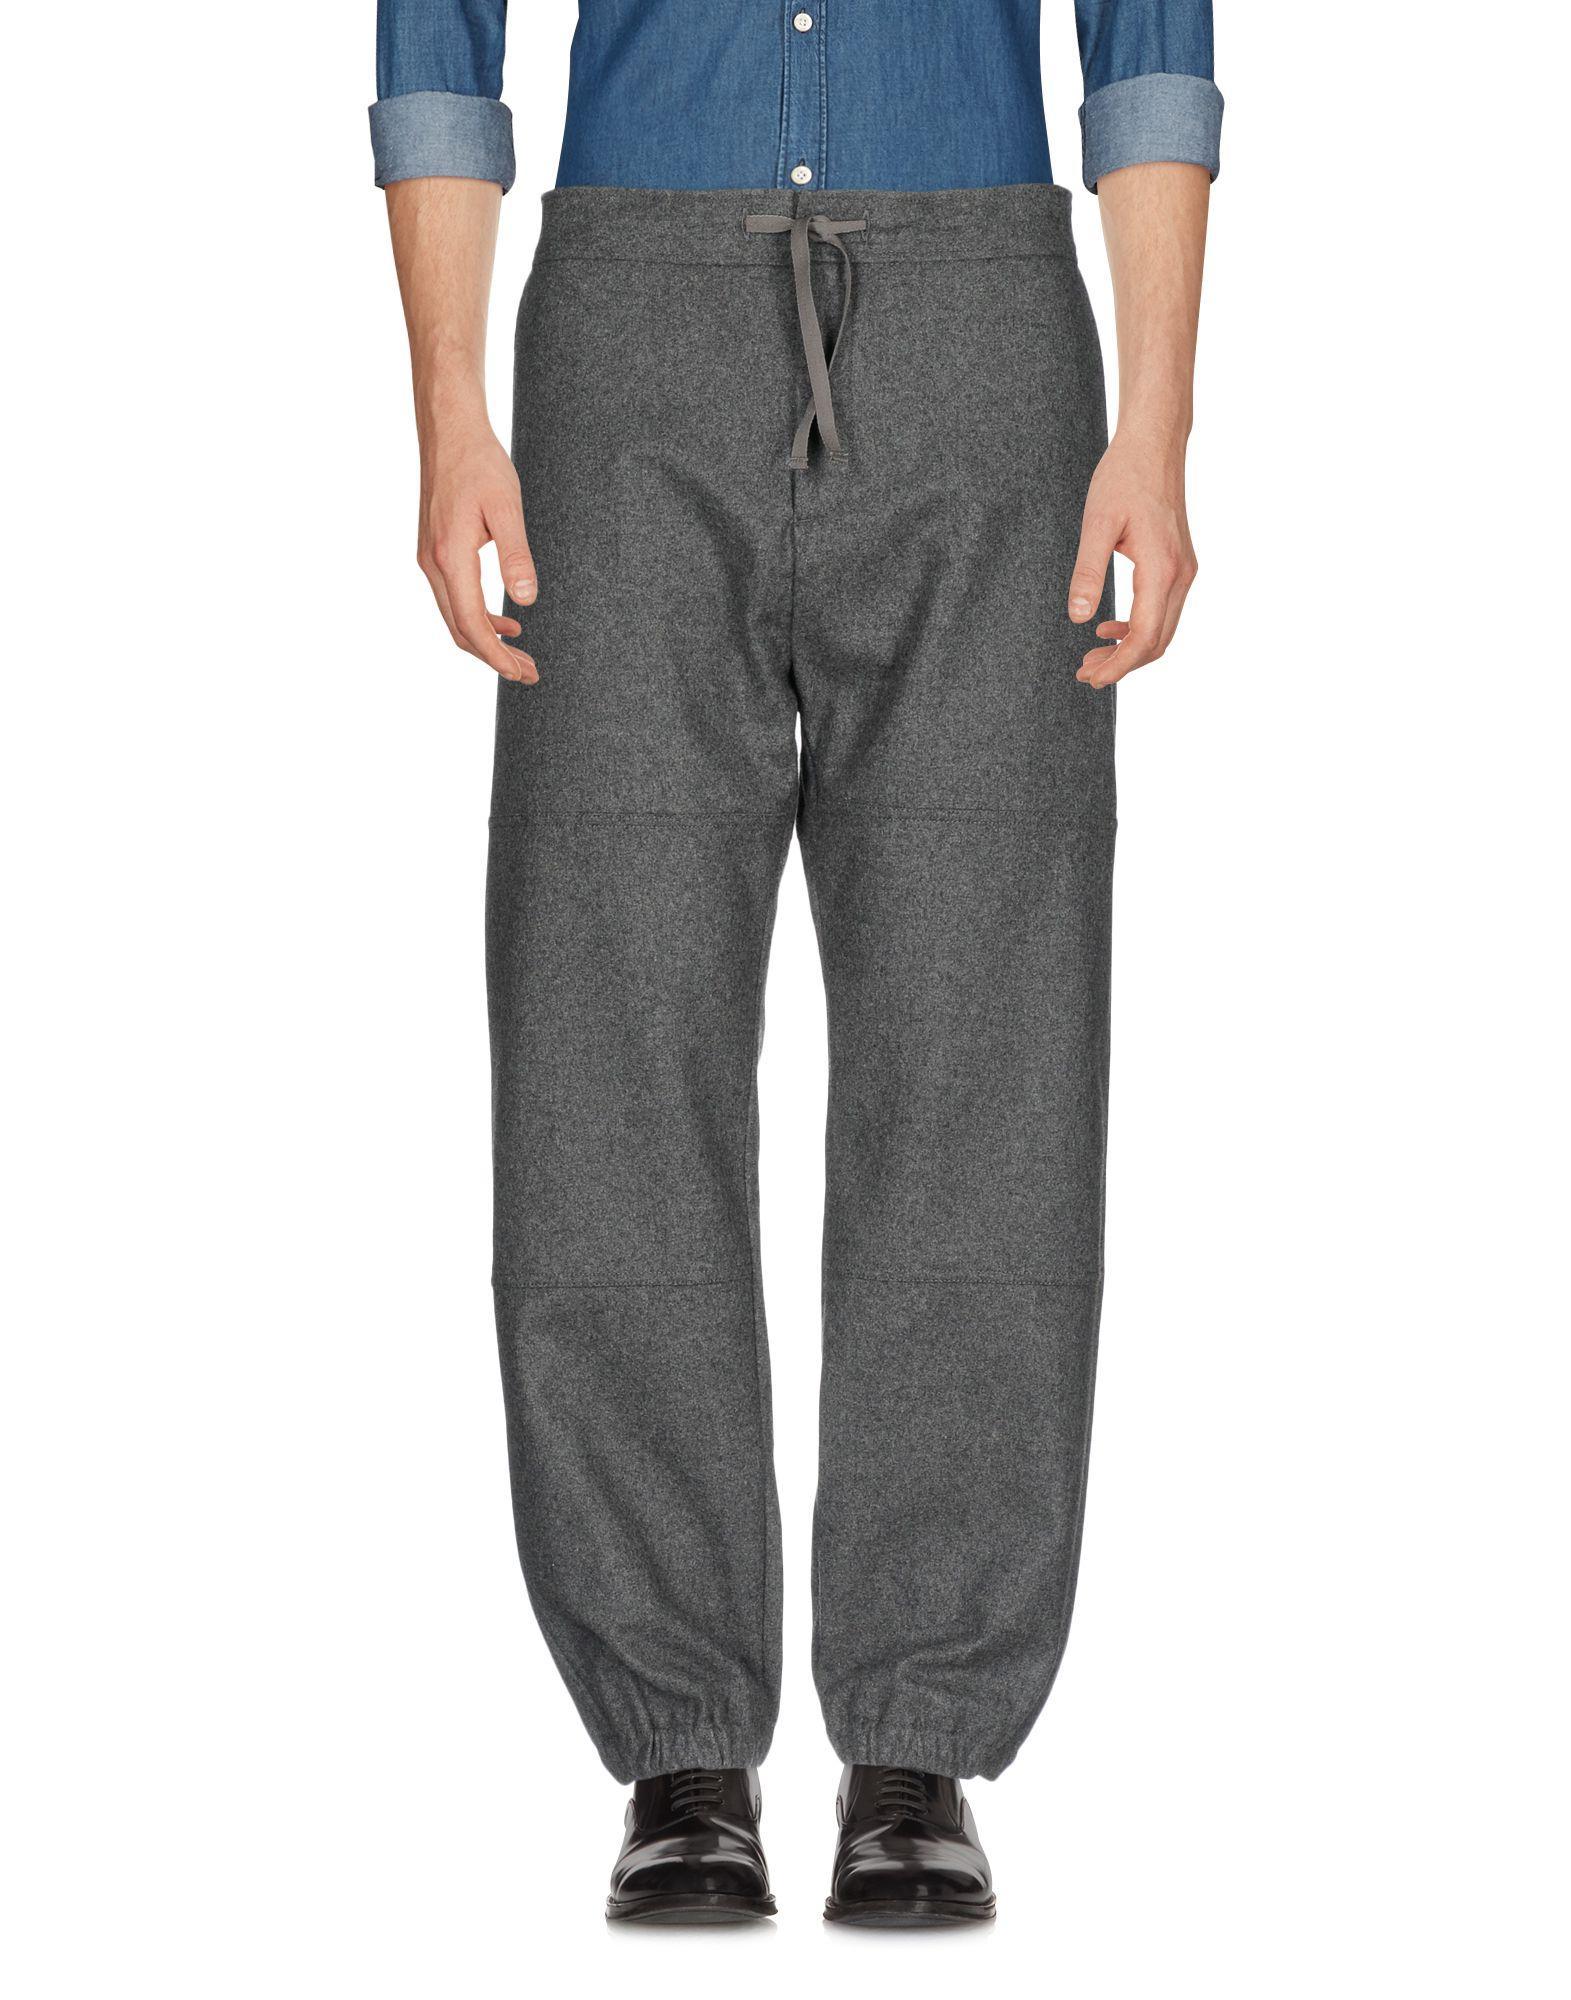 Carhartt Casual Pants In Grey